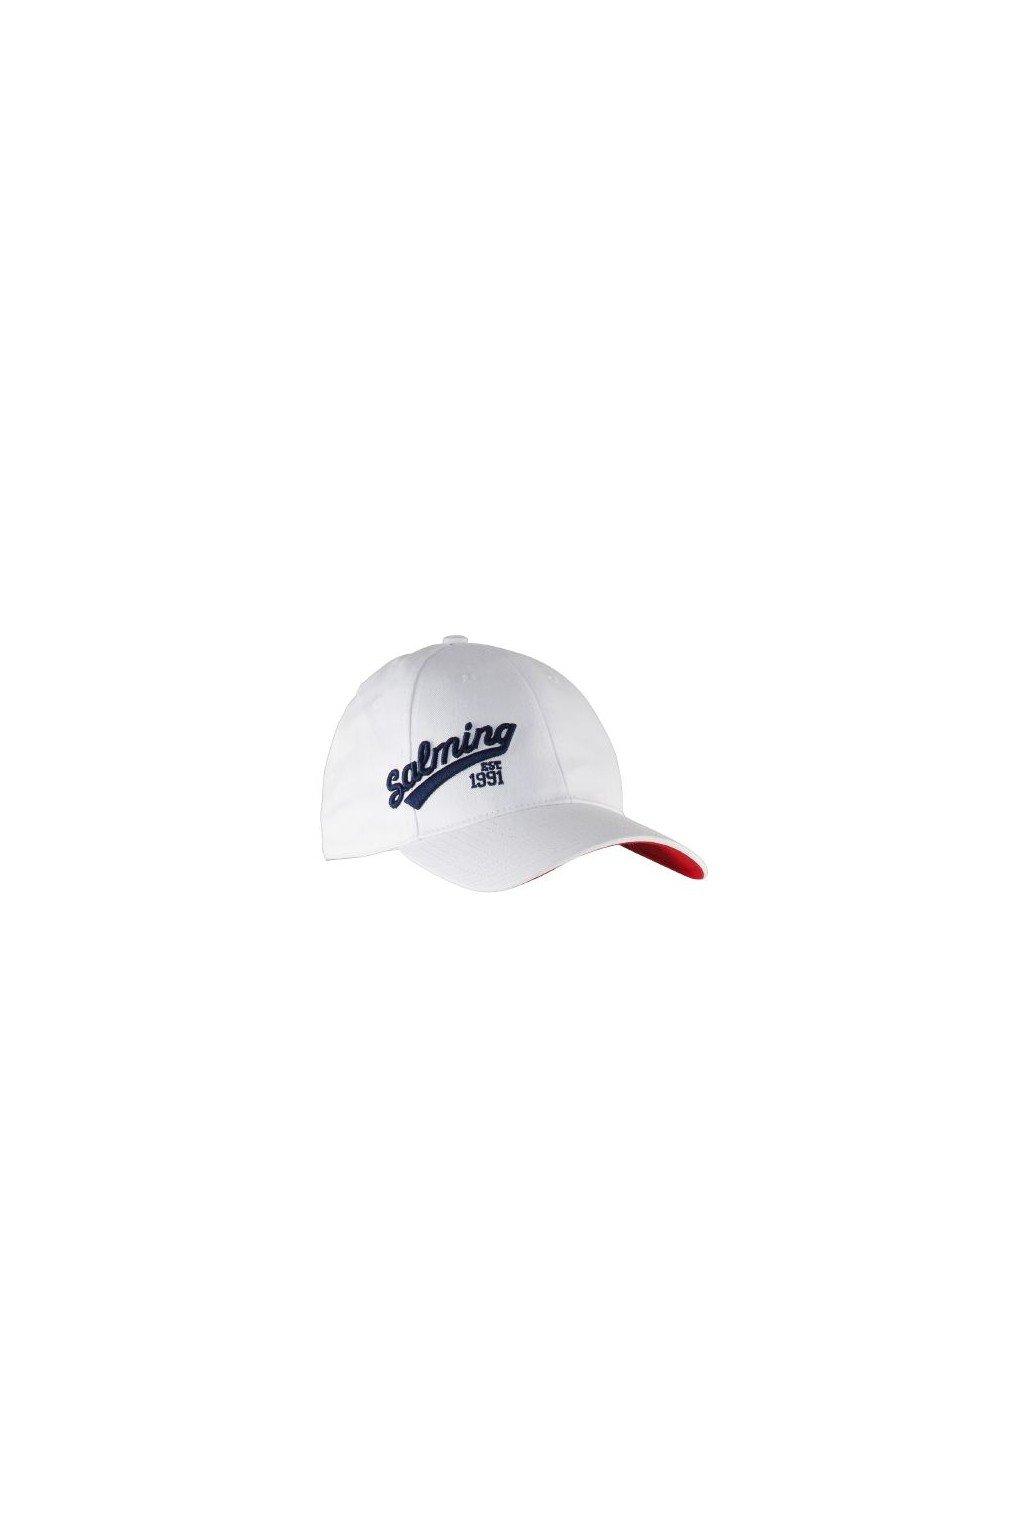 salming epic cap white